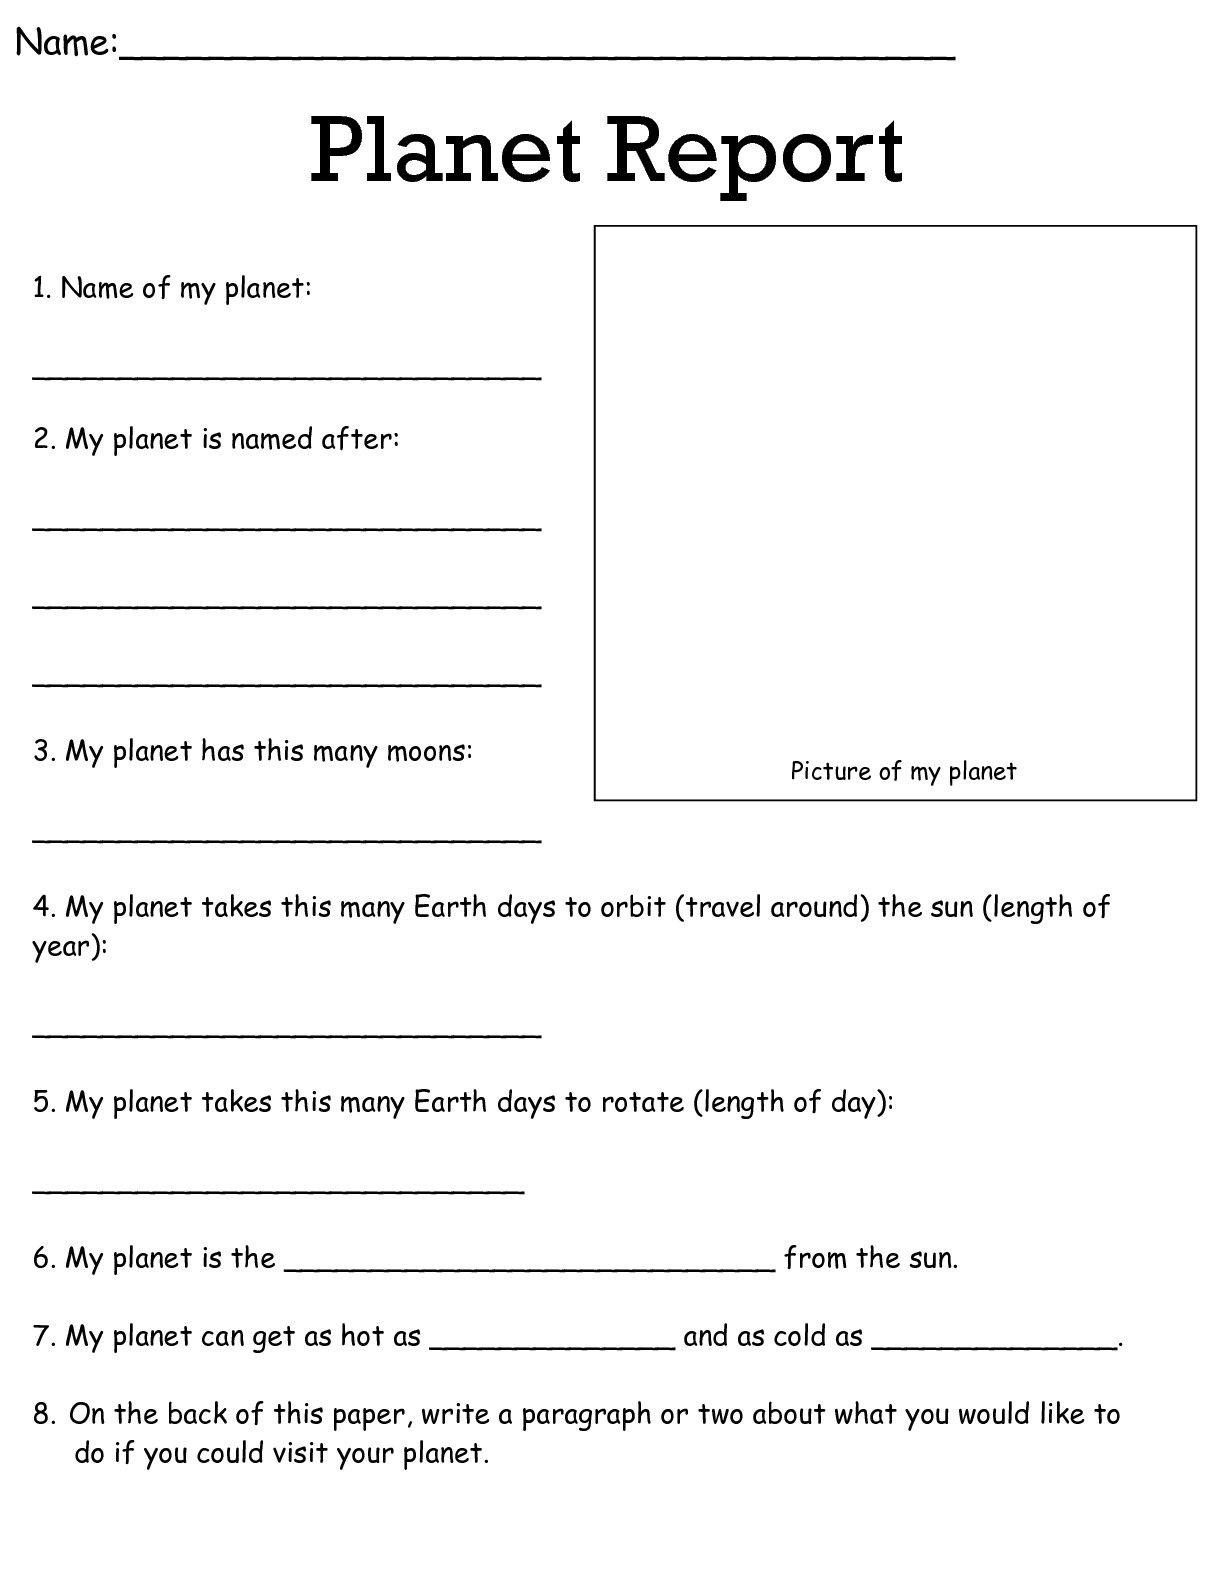 Job Worksheets 5Th &6Th | Science Worksheets Science Worksheets - Free Printable Science Worksheets For Grade 2